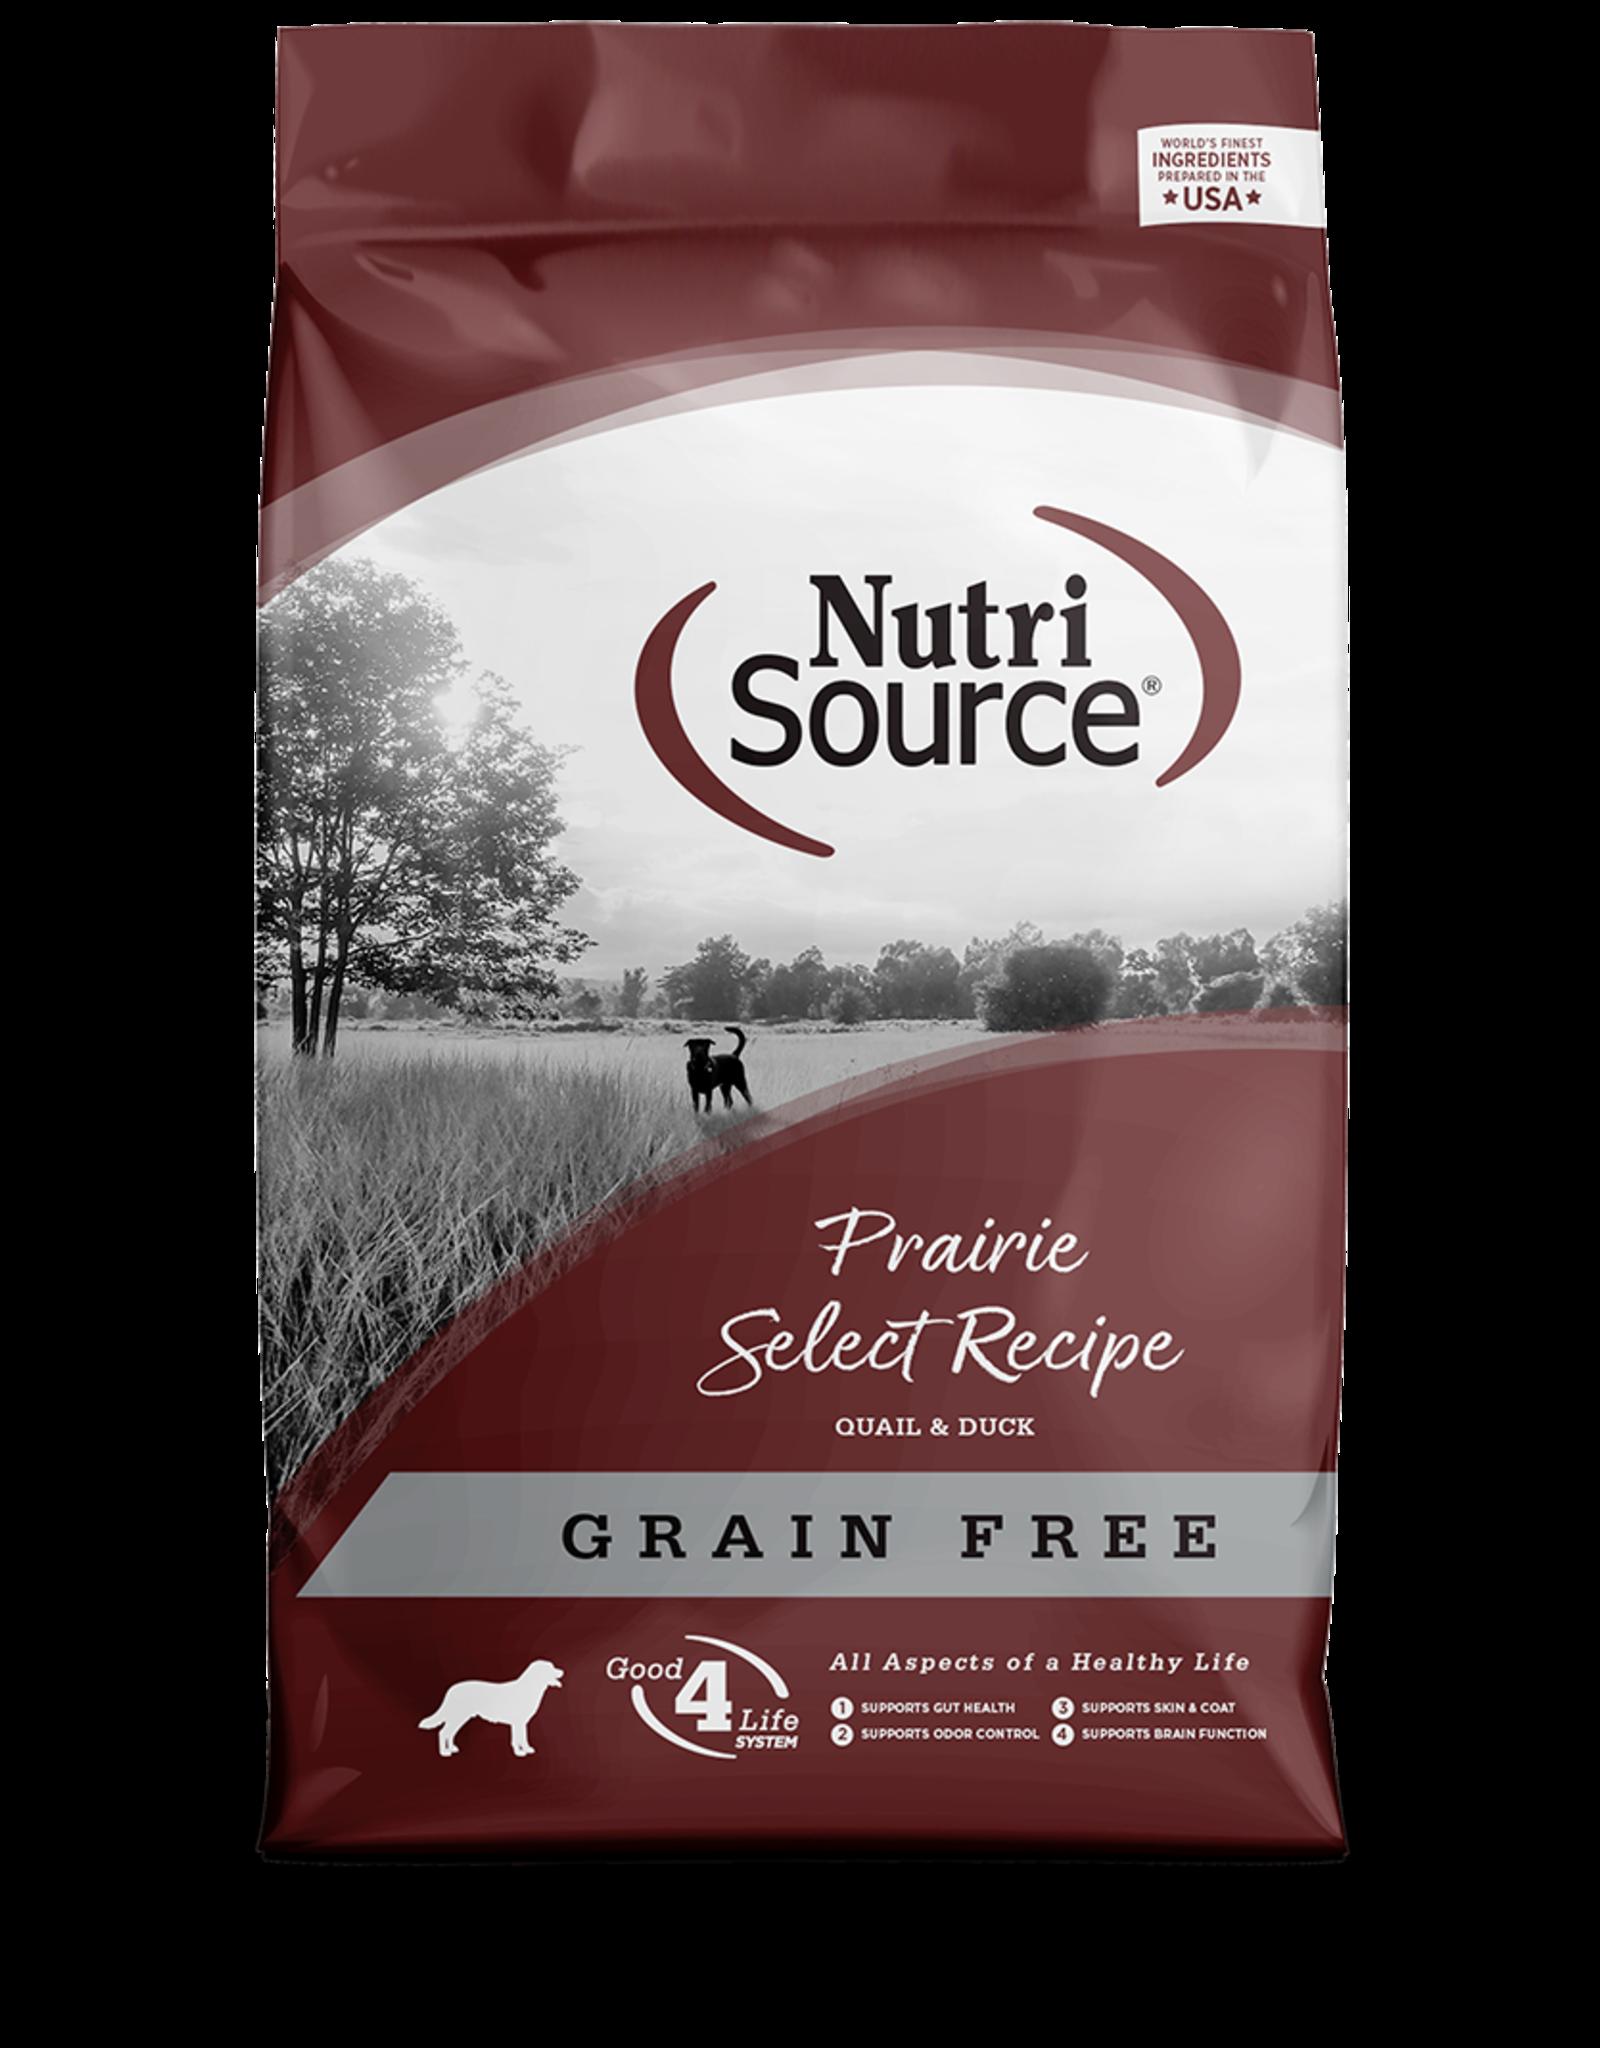 NutriSource NutriSource Dry Dog Food Prairie Select Recipe Quail & Duck Grain Free